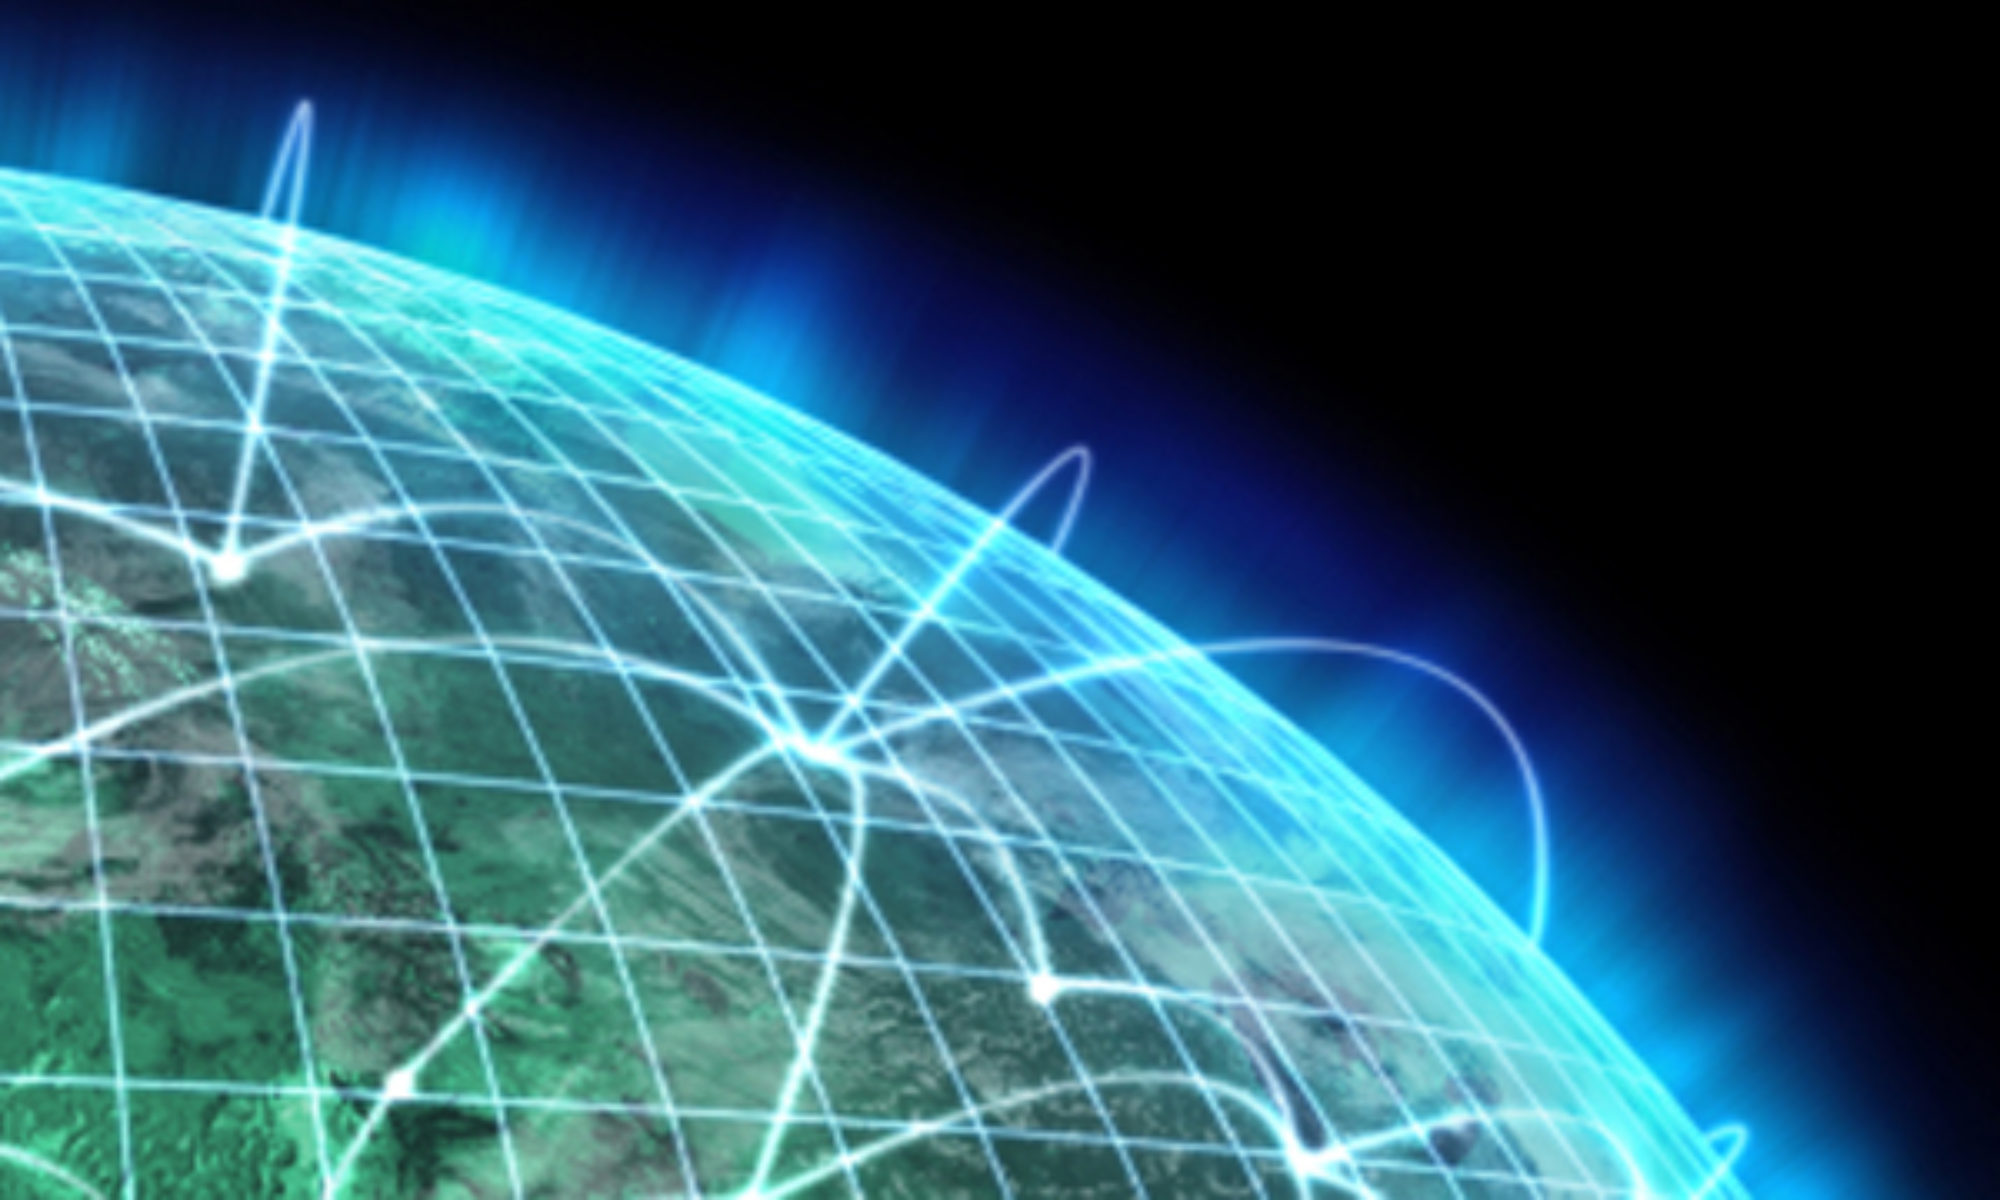 wirevolution.com